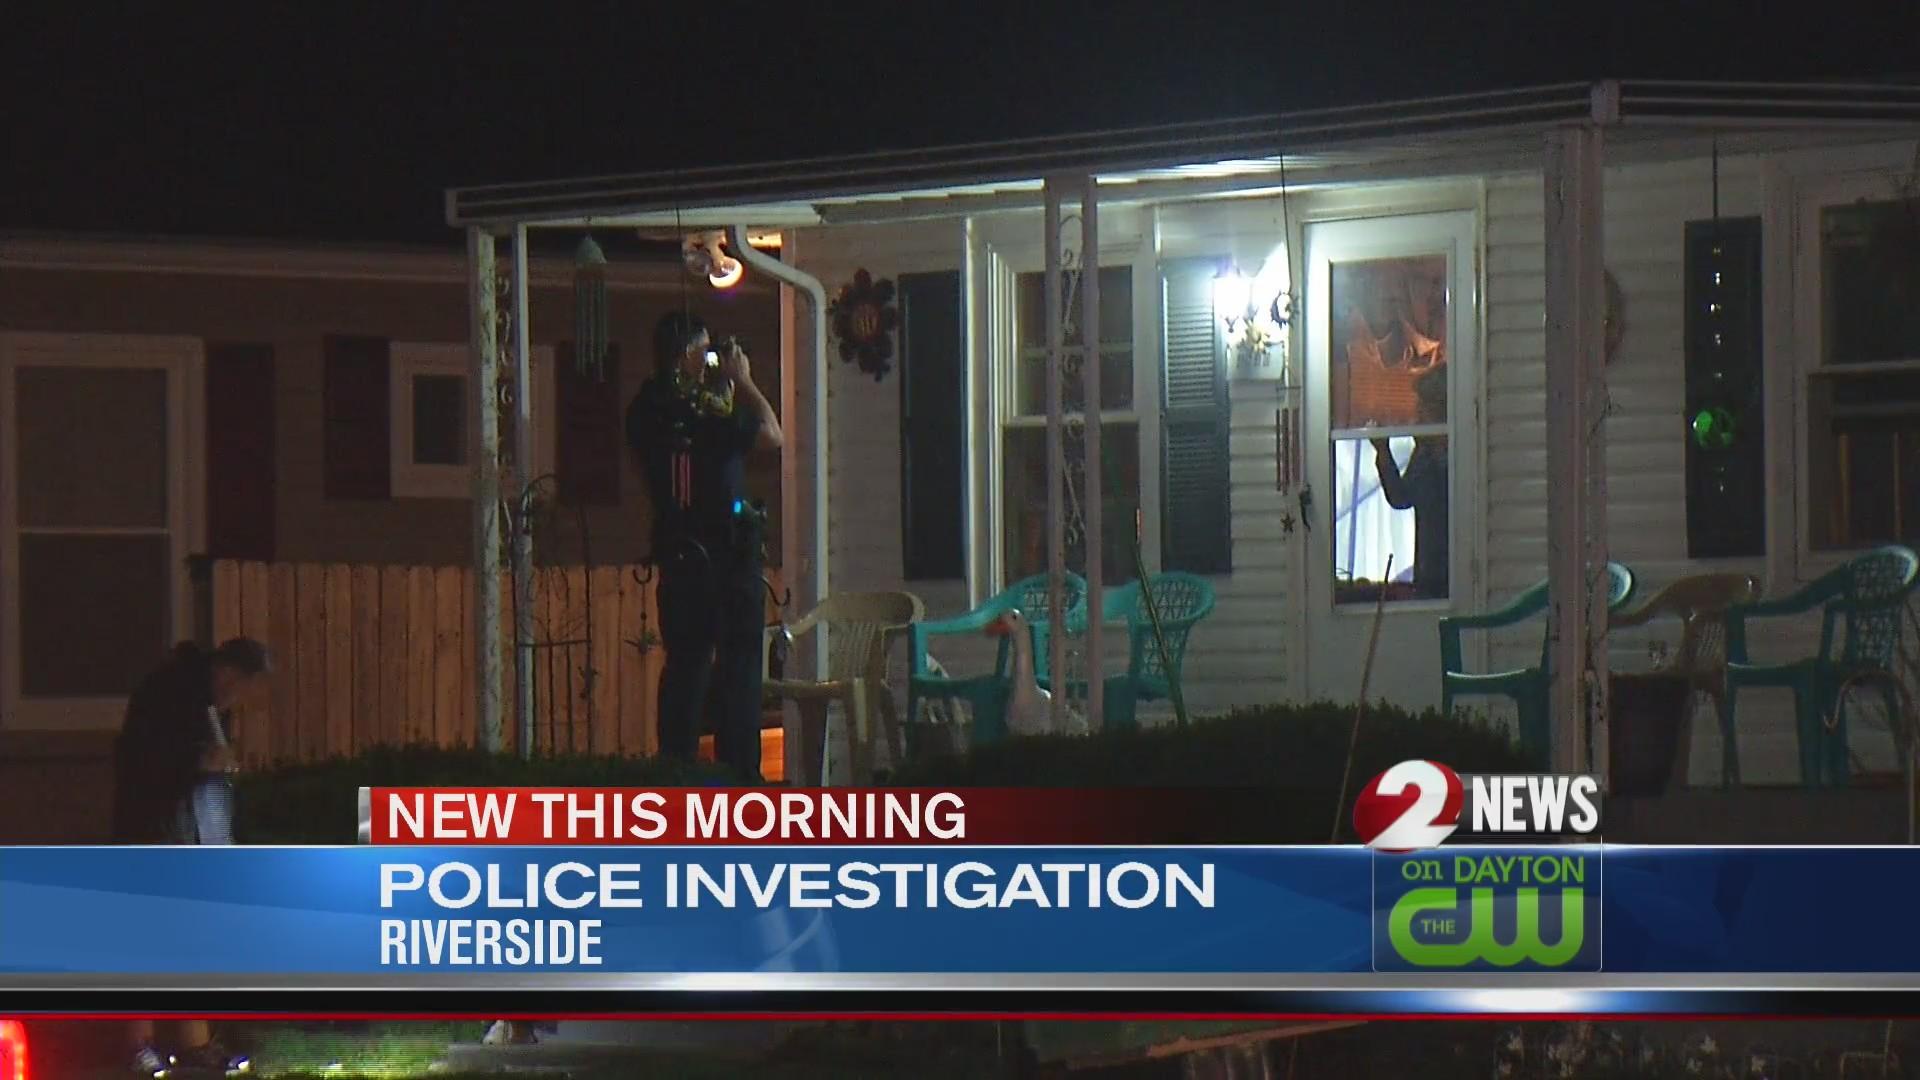 Police investigate Riverside incident